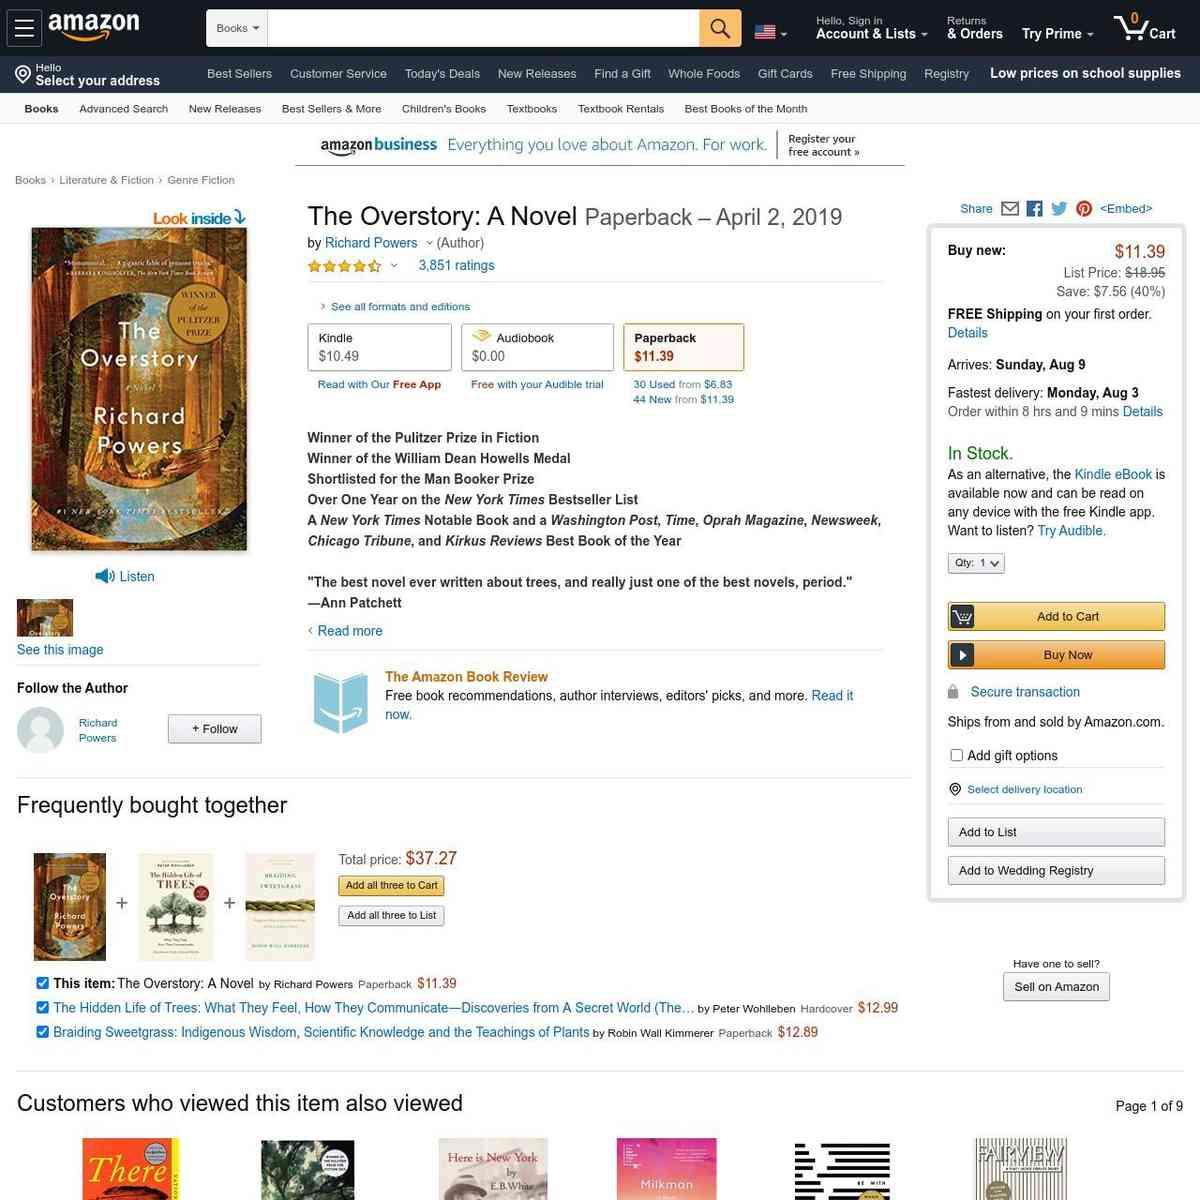 amazon.com/Overstory-Novel-Richard-Powers/dp/039335668X